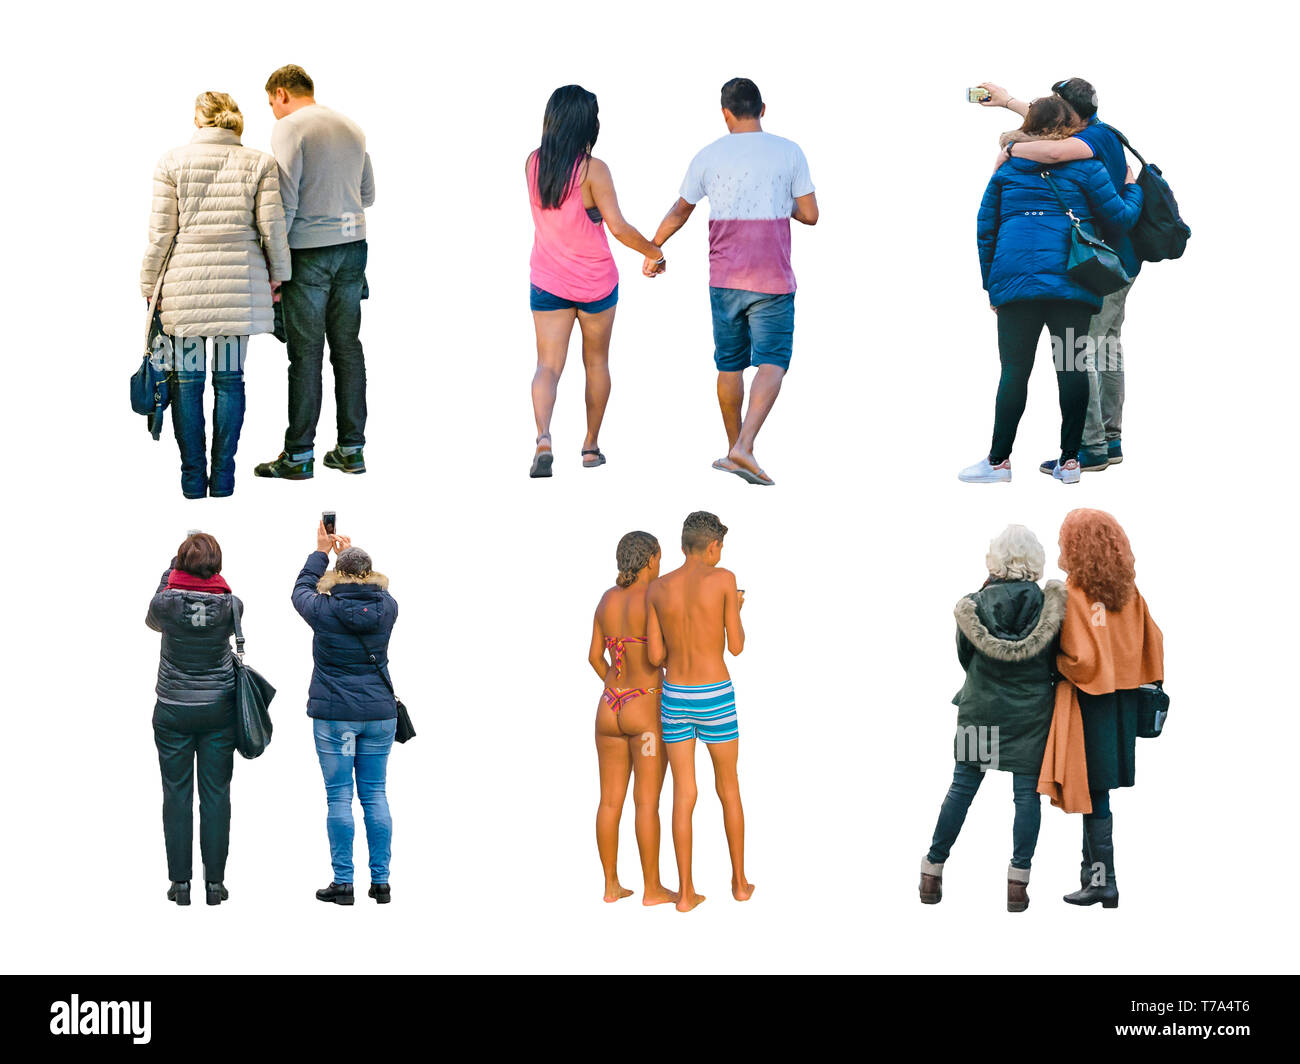 Back view couples photo set isolated on white background - Stock Image